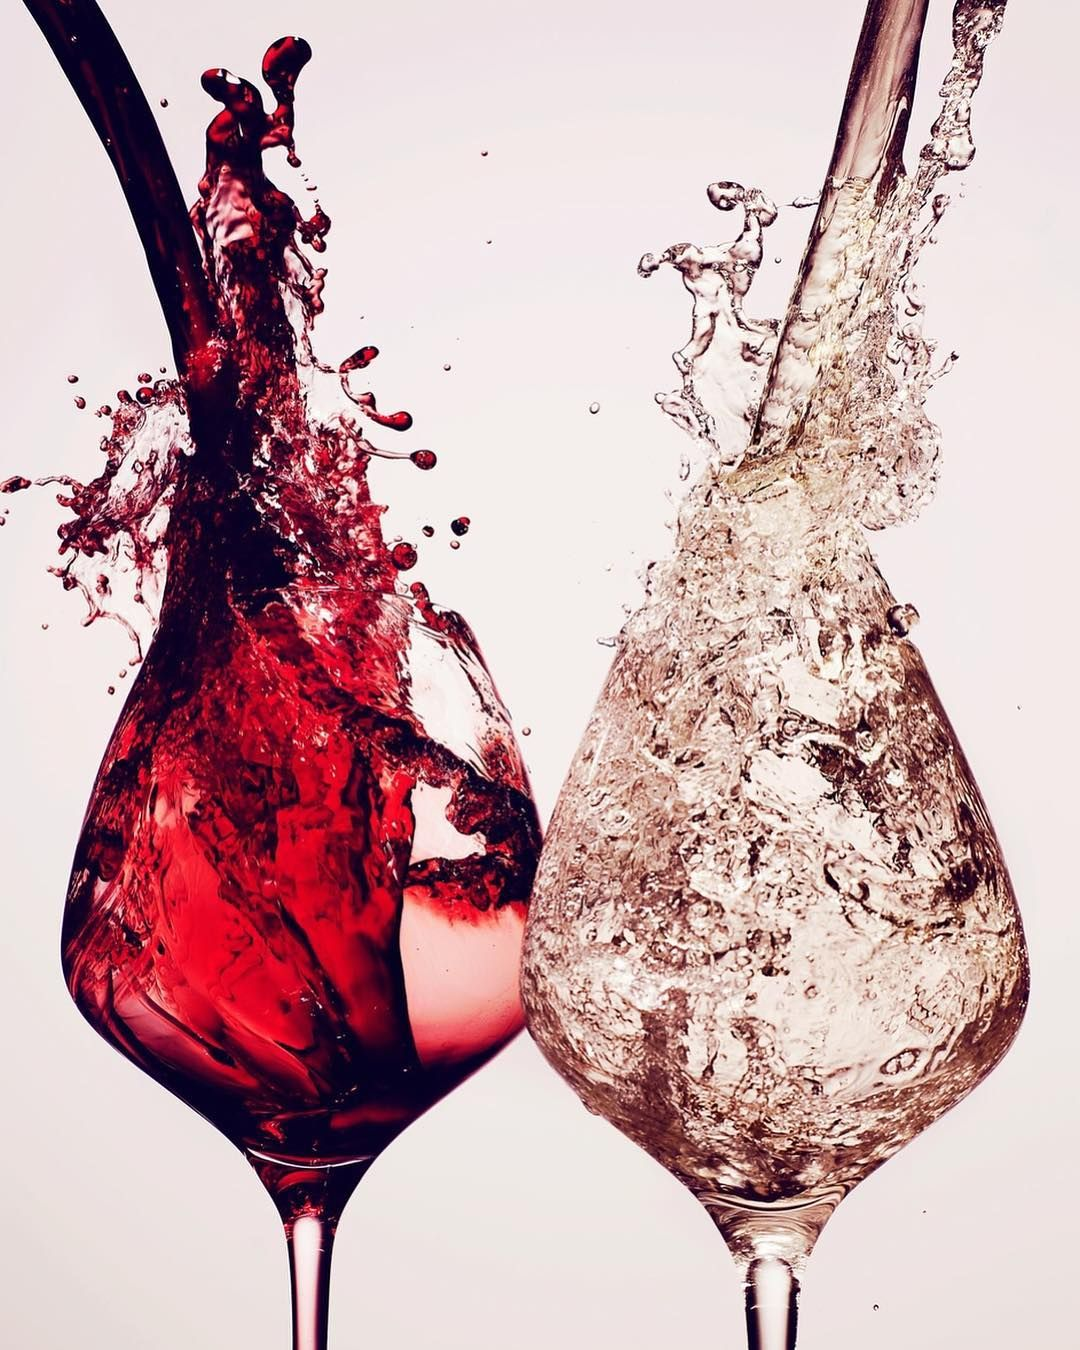 Why Choose Have Both Photo By Jamiechungphoto Cheers Wine Moreismore Redandwhite Jamiechung Wine Drinks Wine And Beer Image Drink